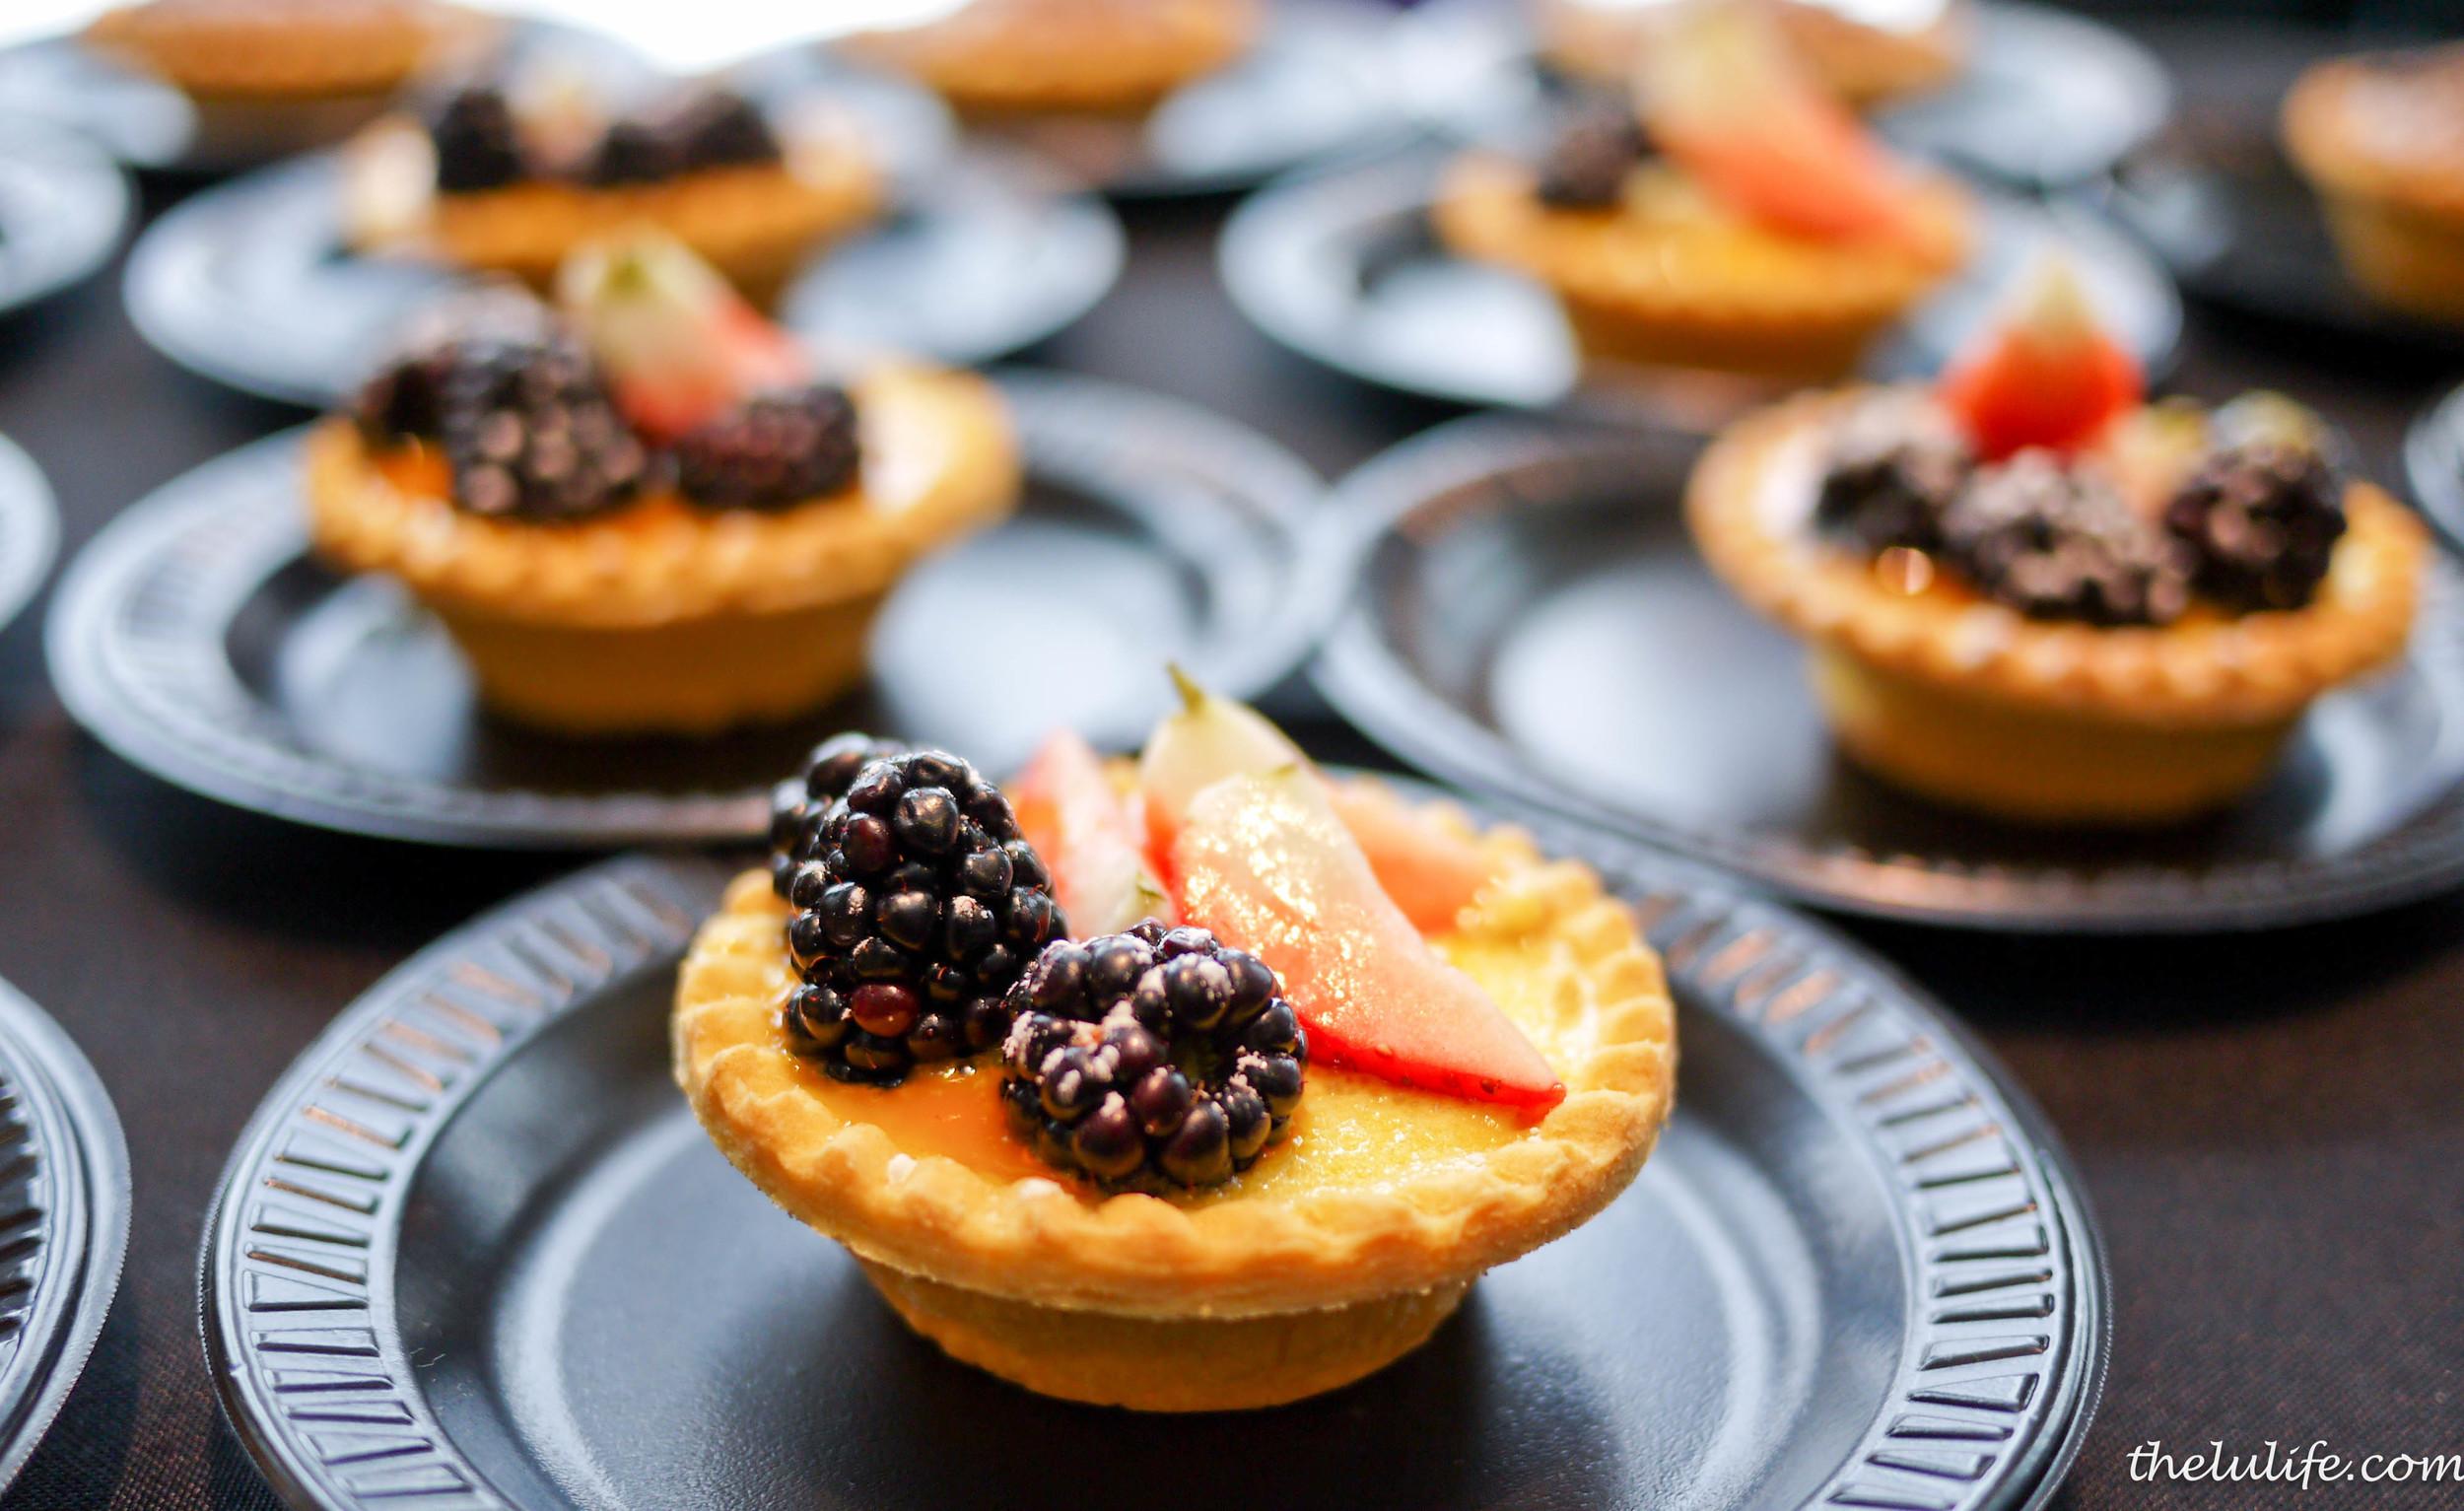 Passionfruit tart by Roy's Restaurant